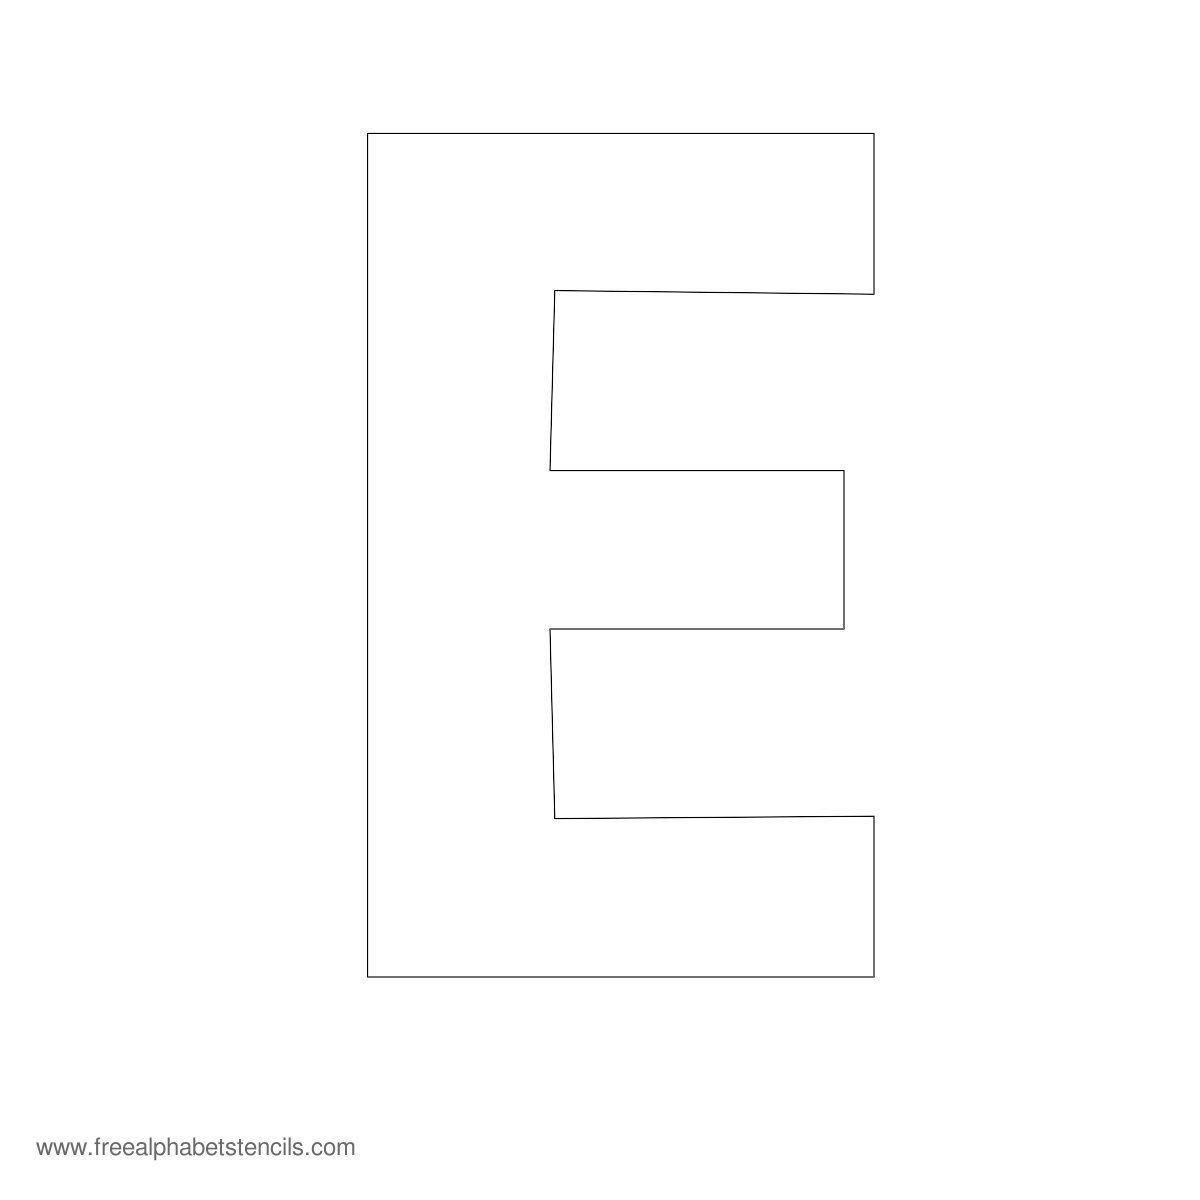 Large alphabet stencil e wood pinterest for Large wooden letter patterns